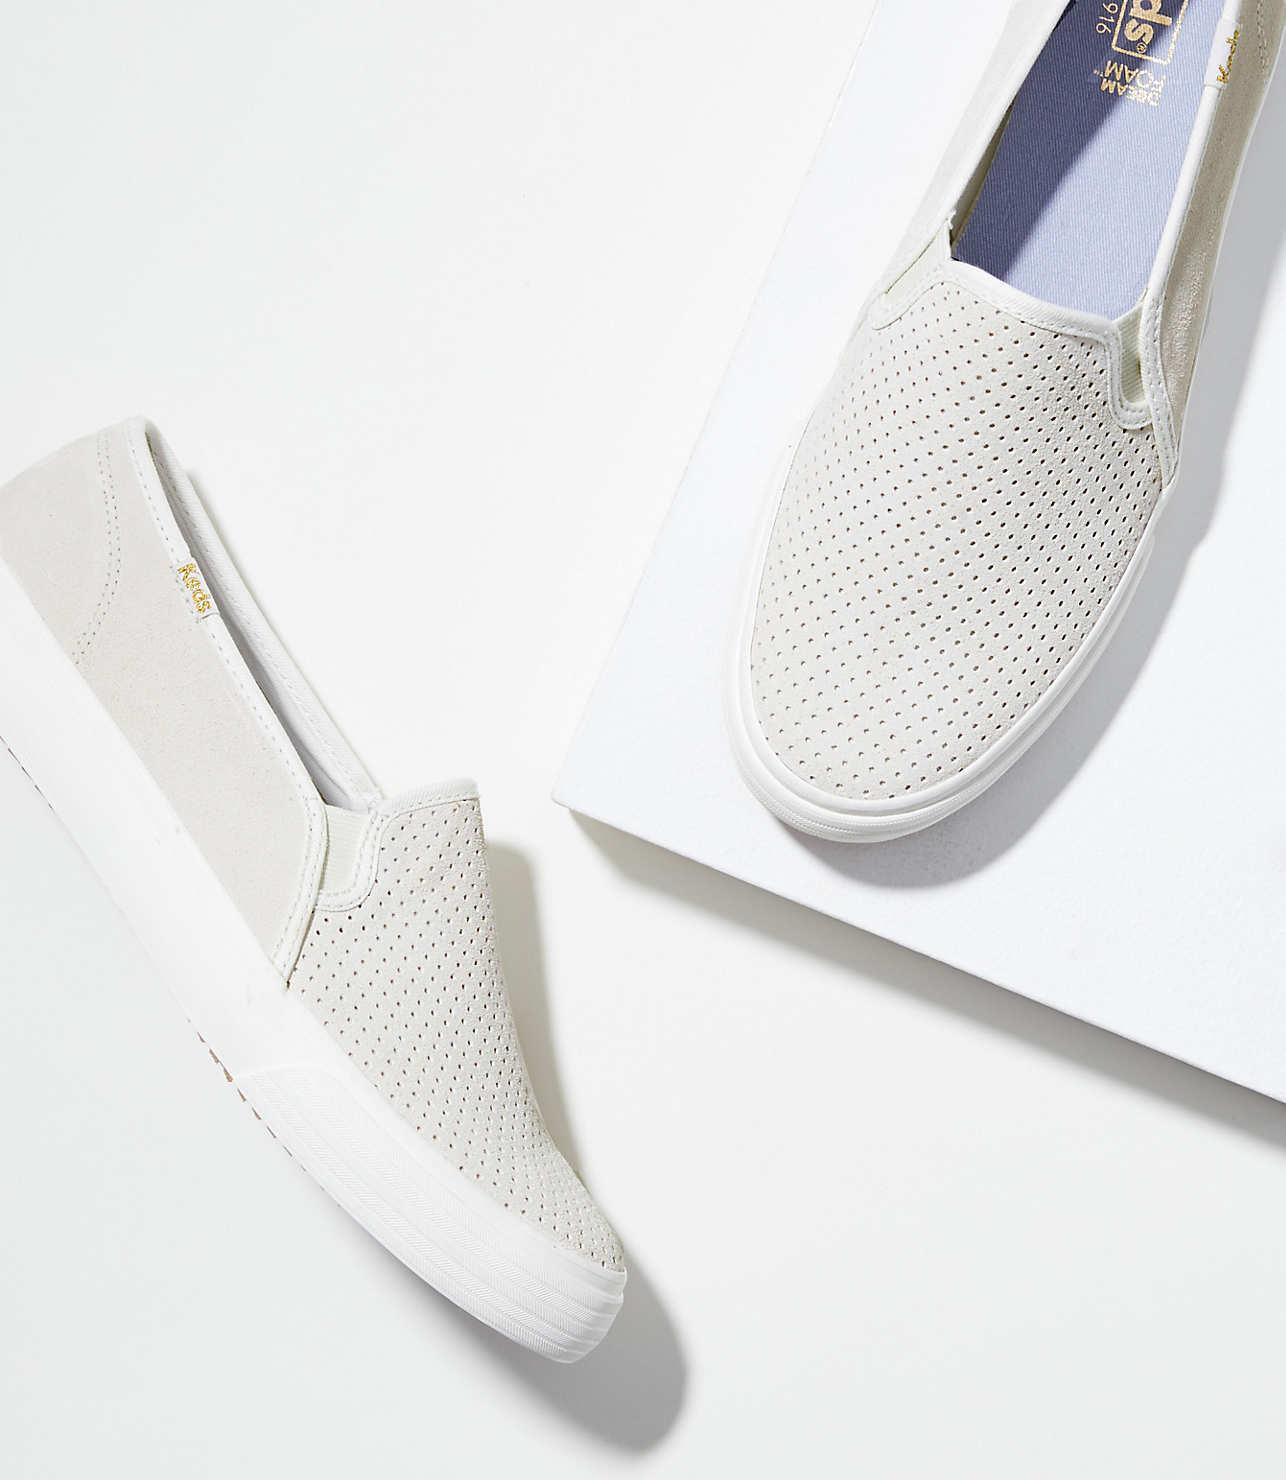 Keds Double Decker Perf Suede Sneakers by Loft